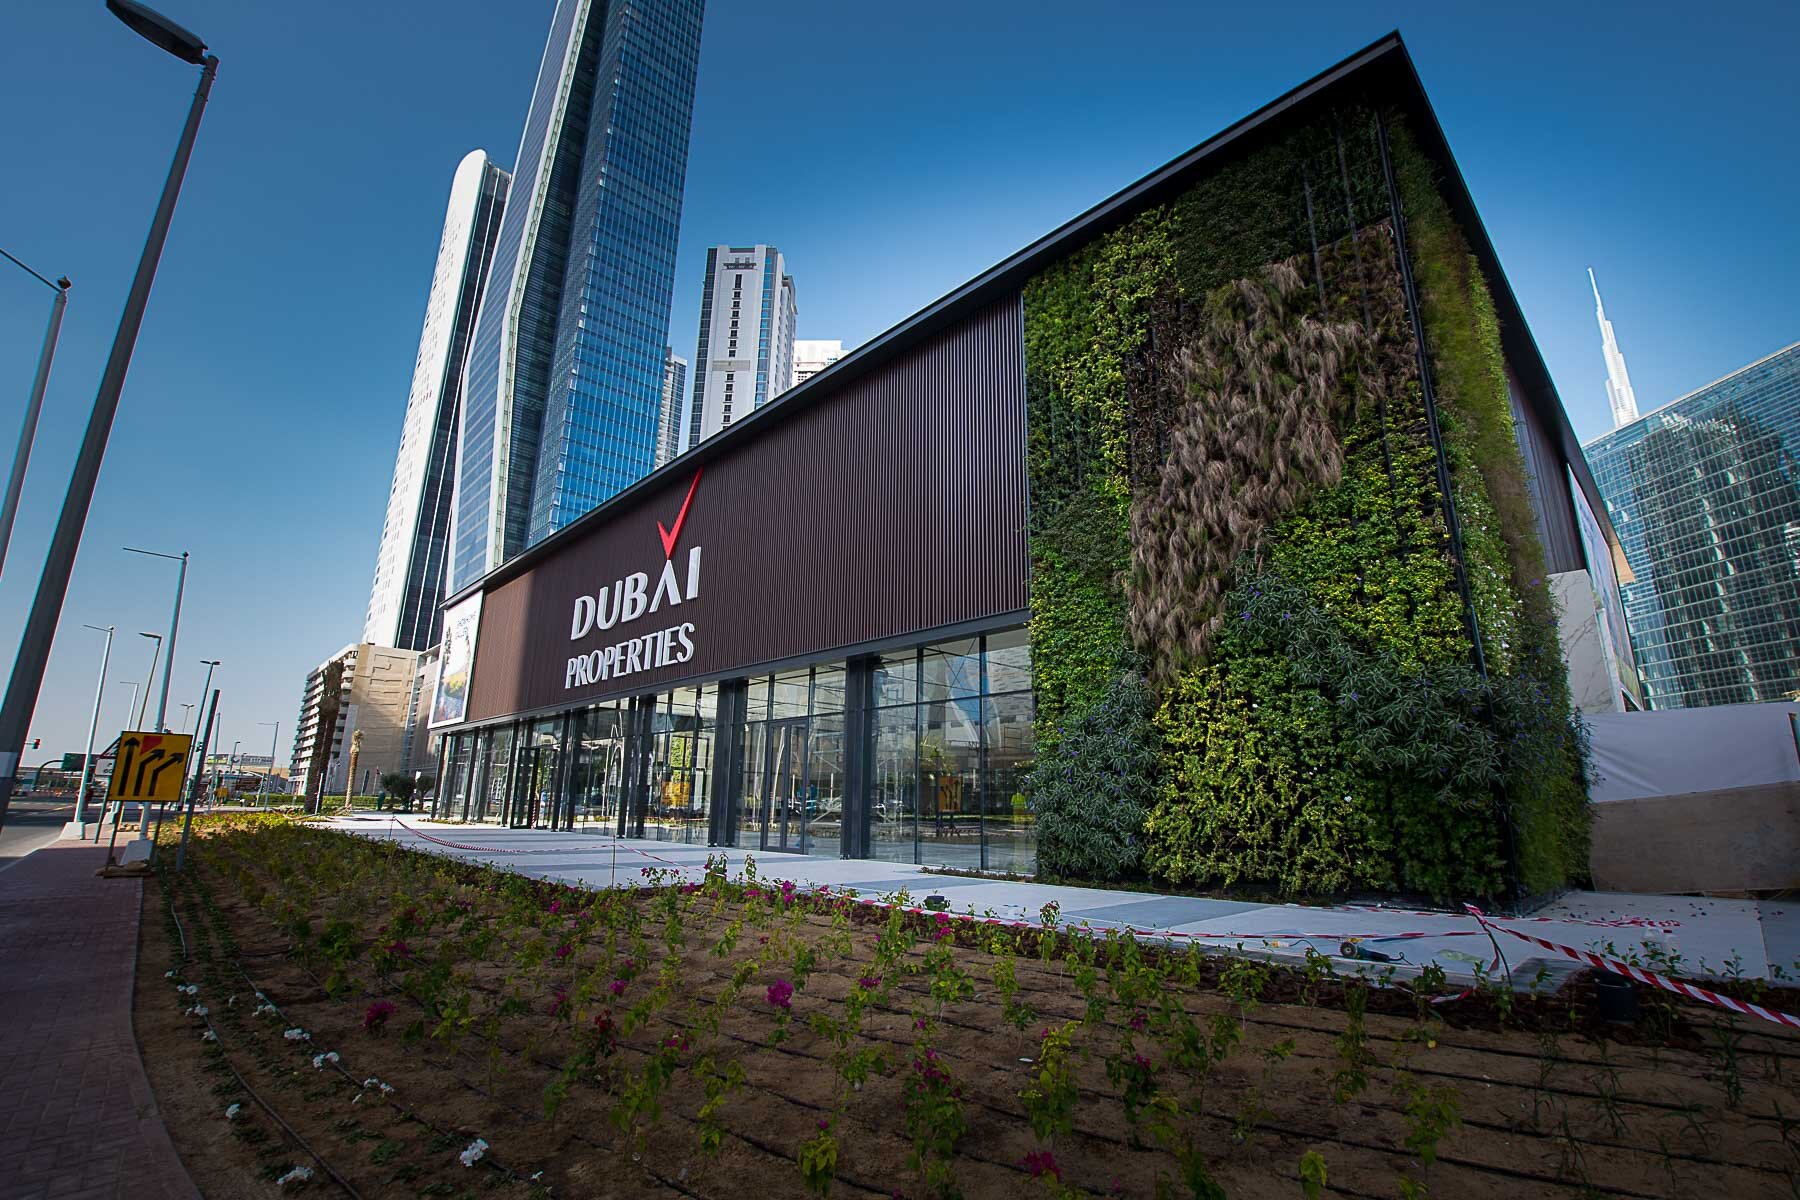 Biel_Group_Dubai_Properties_High_Cube_Temporary_Structure_Tent_2018-1066.jpg